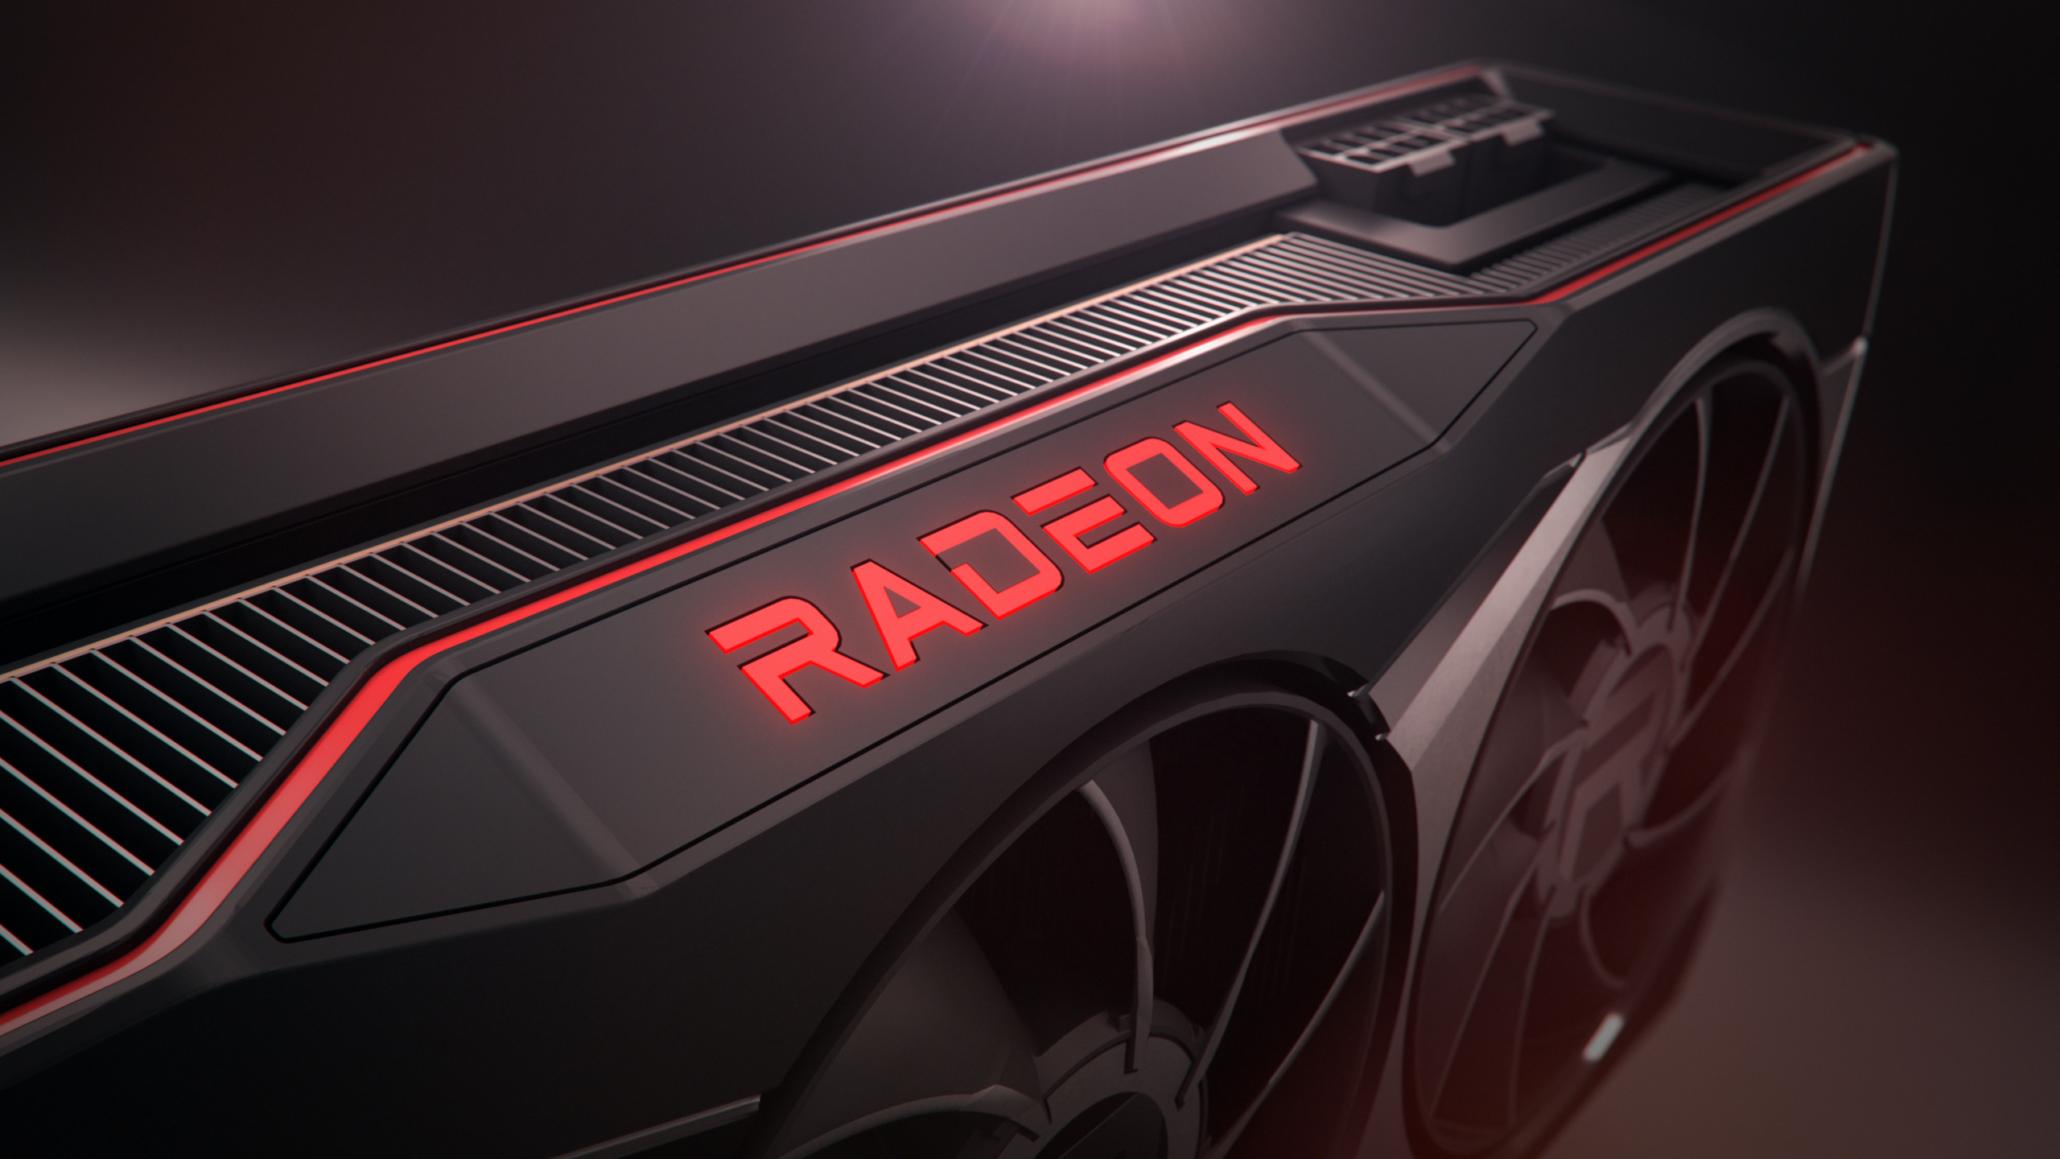 AMD Radeon RX 6700 XT & Radeon RX 6700 'Navi 22' Graphics Cards Diduga Diluncurkan pada Akhir Maret